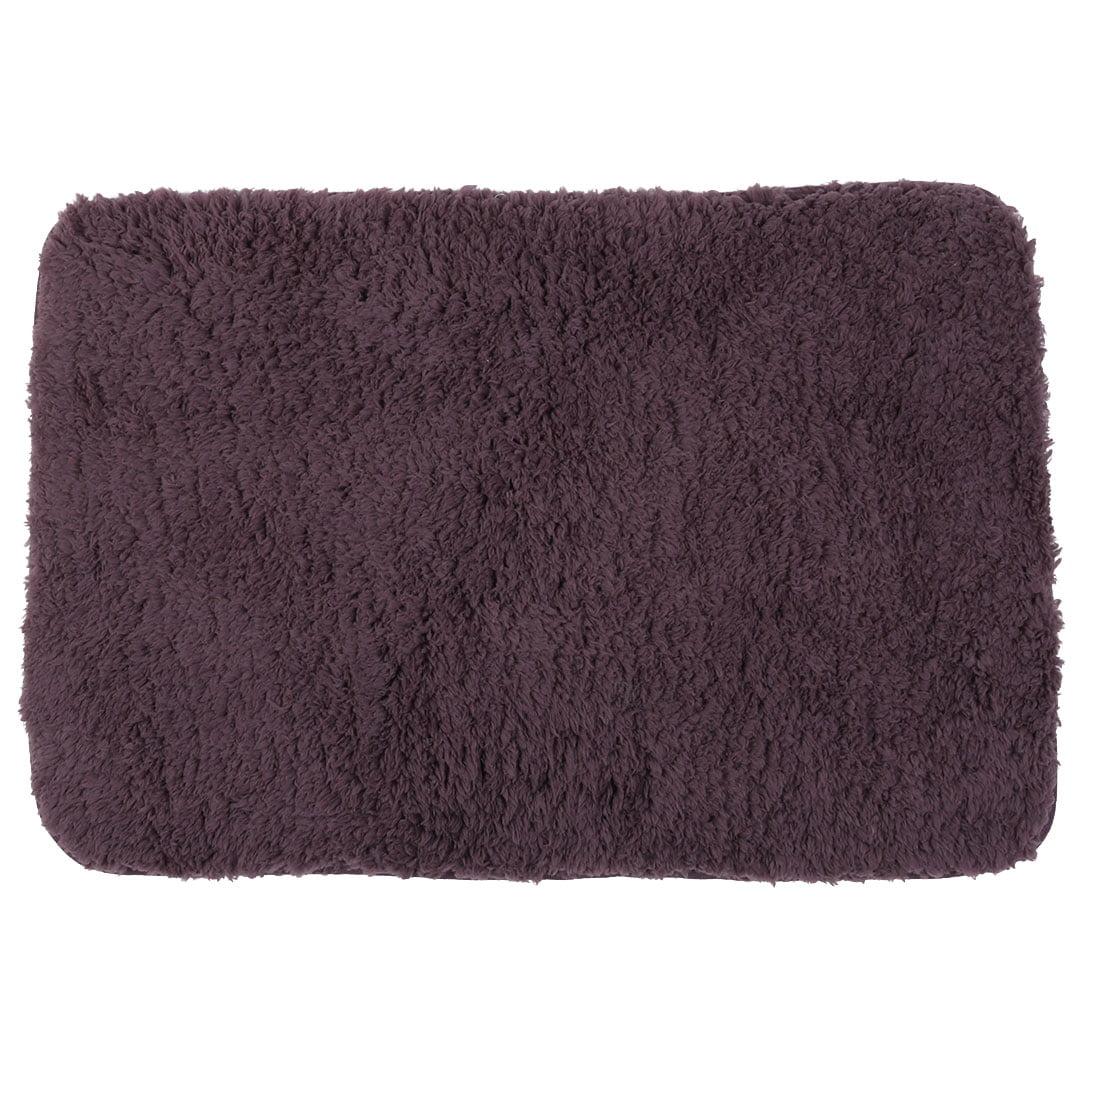 Bedroom Plush Rectangle Water Absorption Doormat Bathmat Dark Purple 60 x 40cm